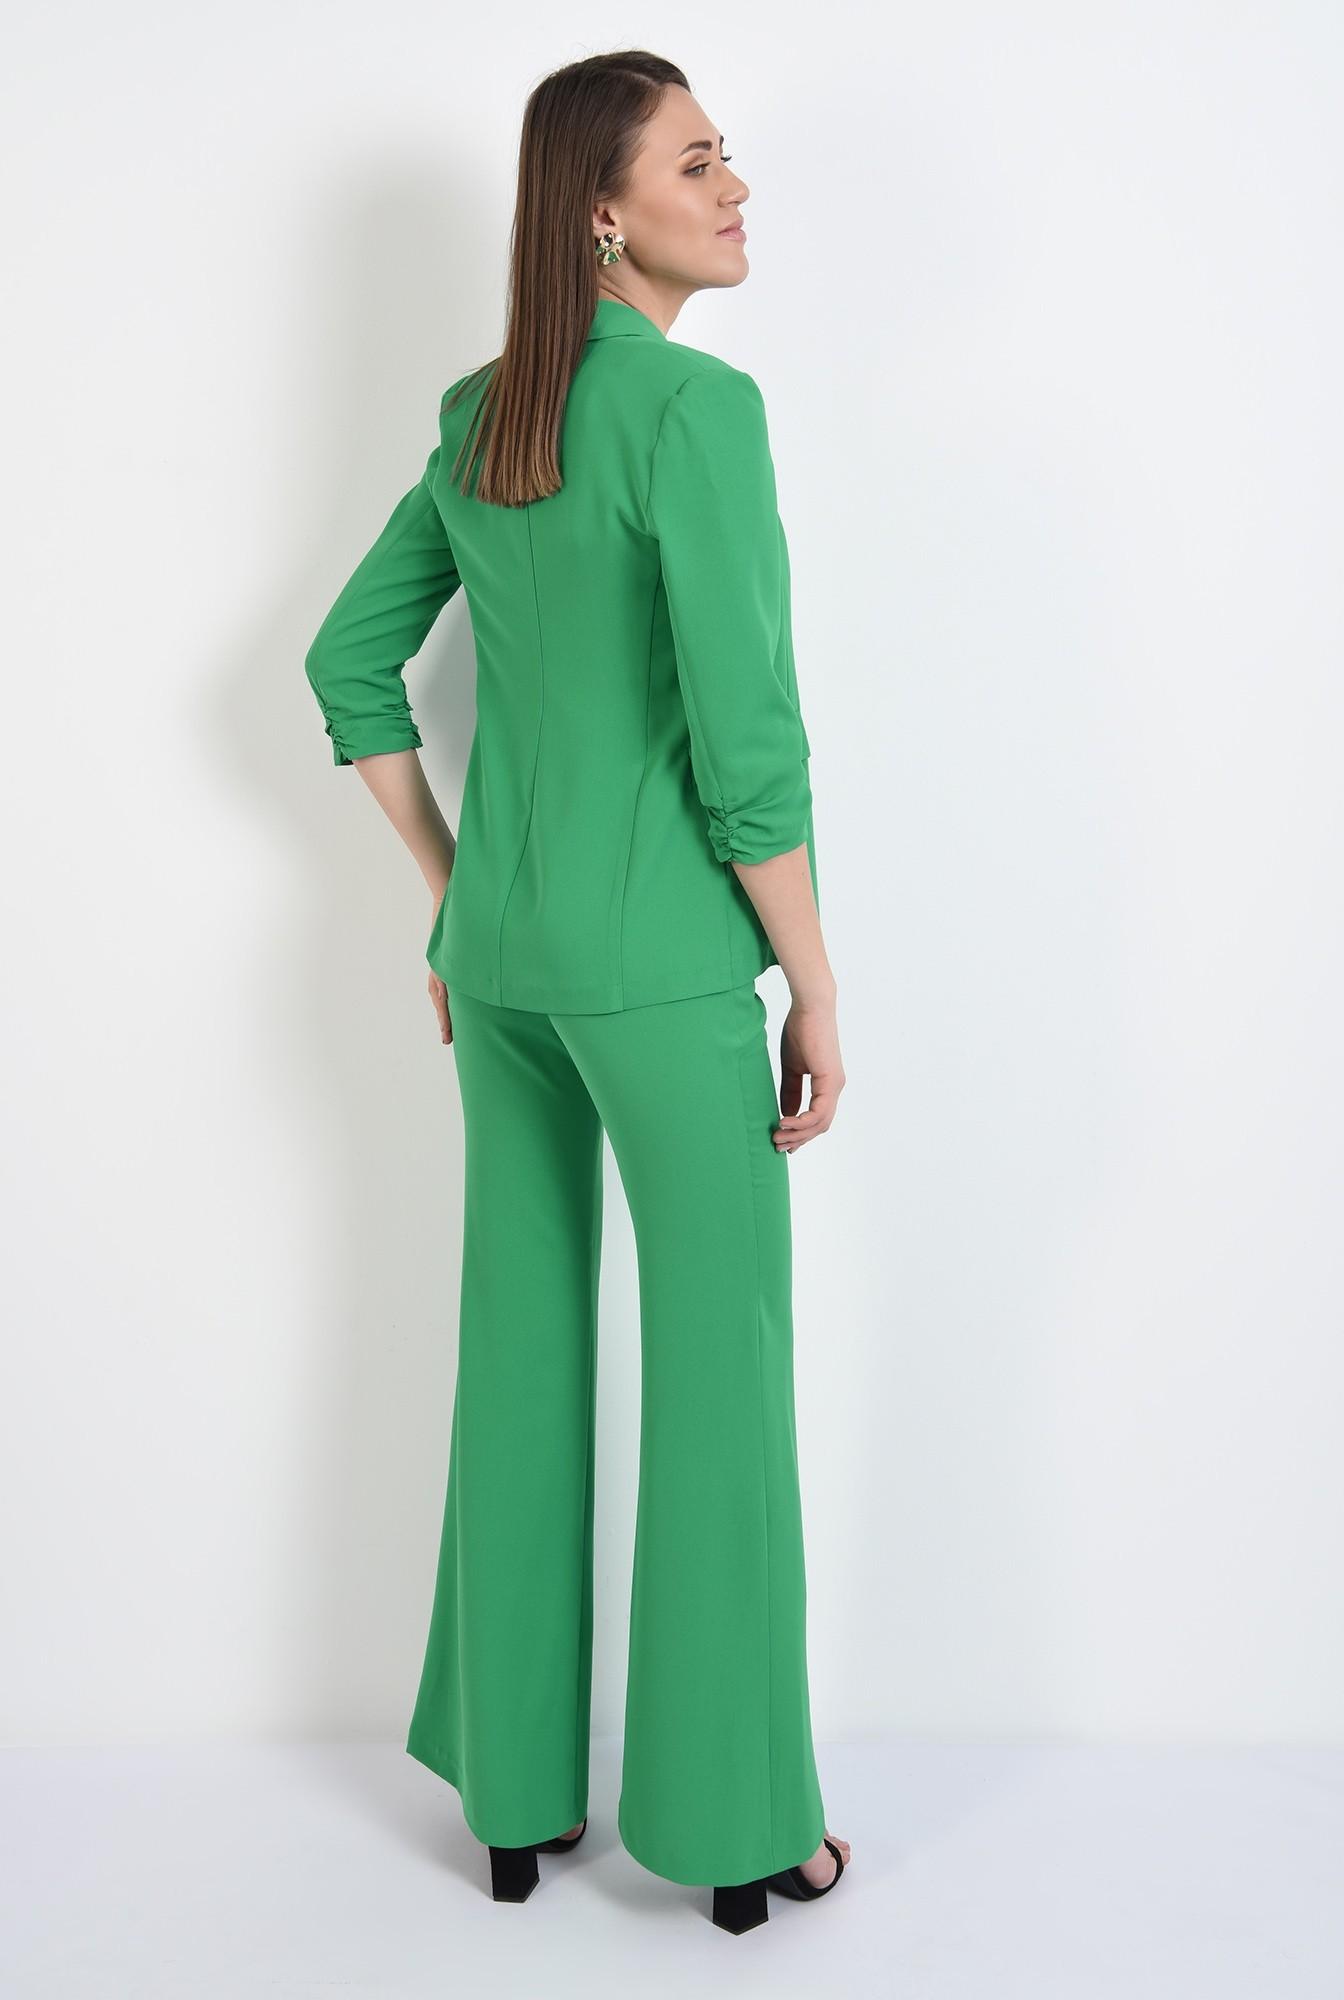 1 -  sacou verde, casual, subtire, maneci fronsate, fara sistem de inchidere